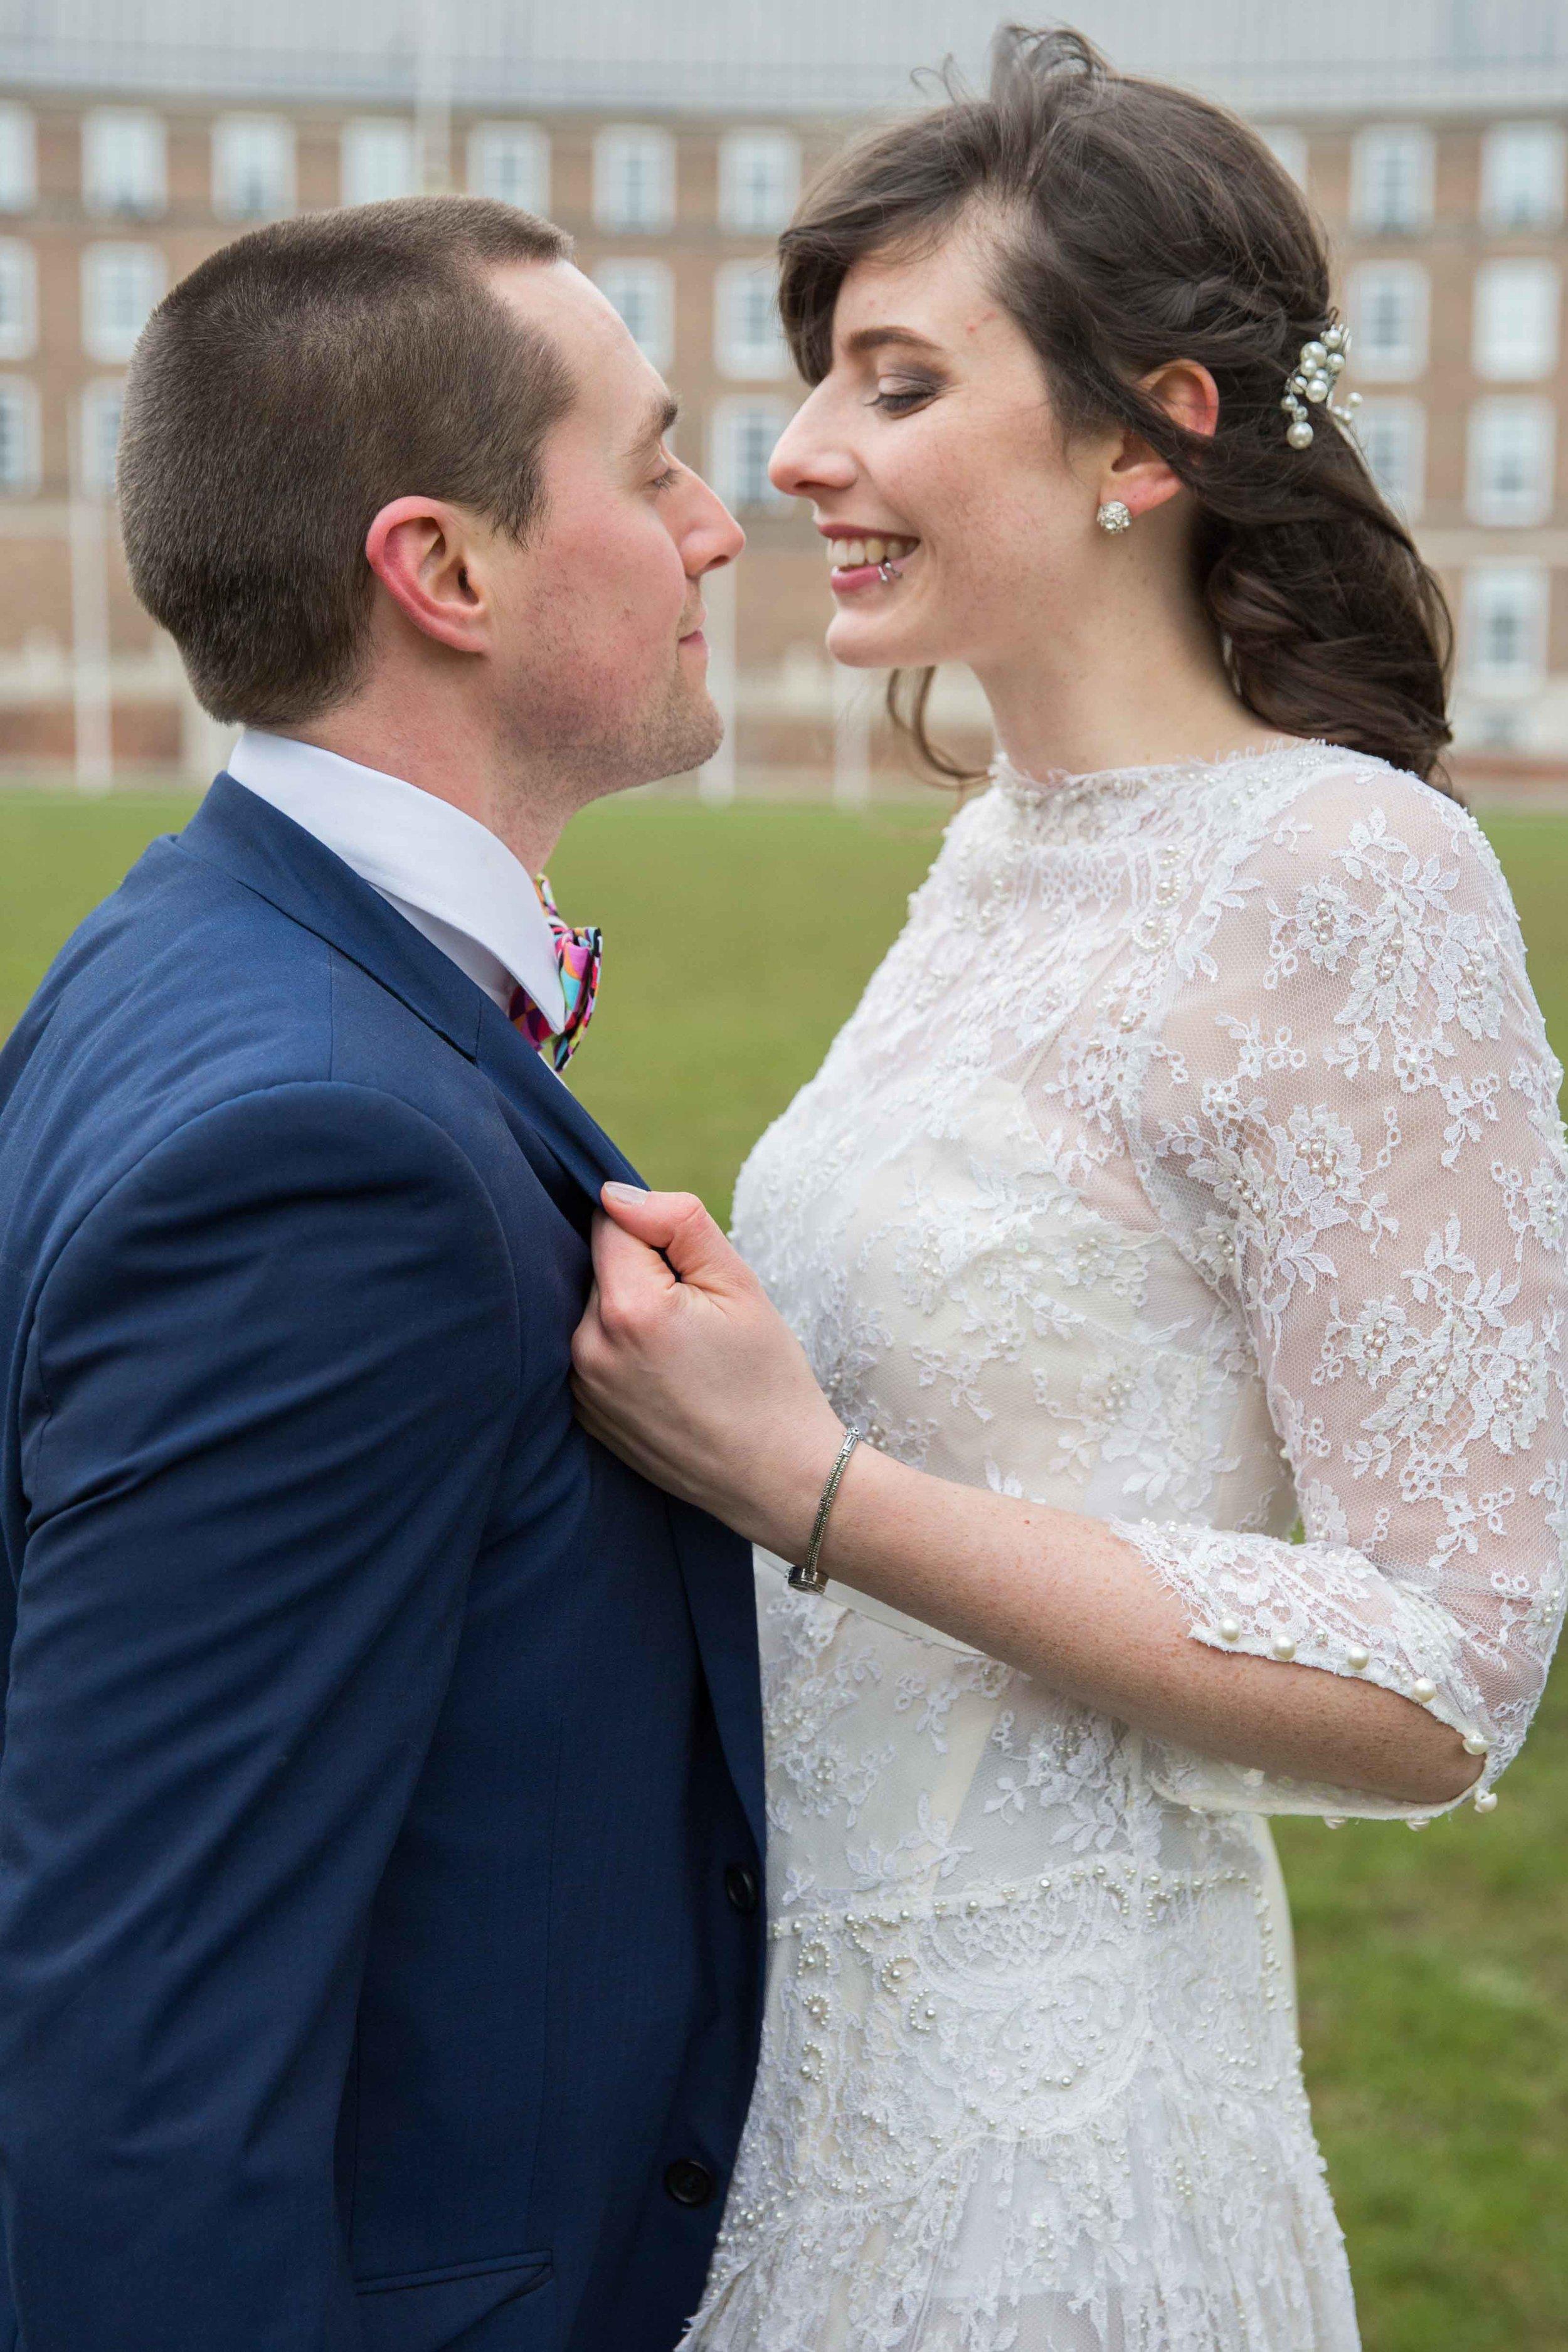 Adam & Faye - Wright Wedding Photography - Bristol Wedding Photographer -269.jpg